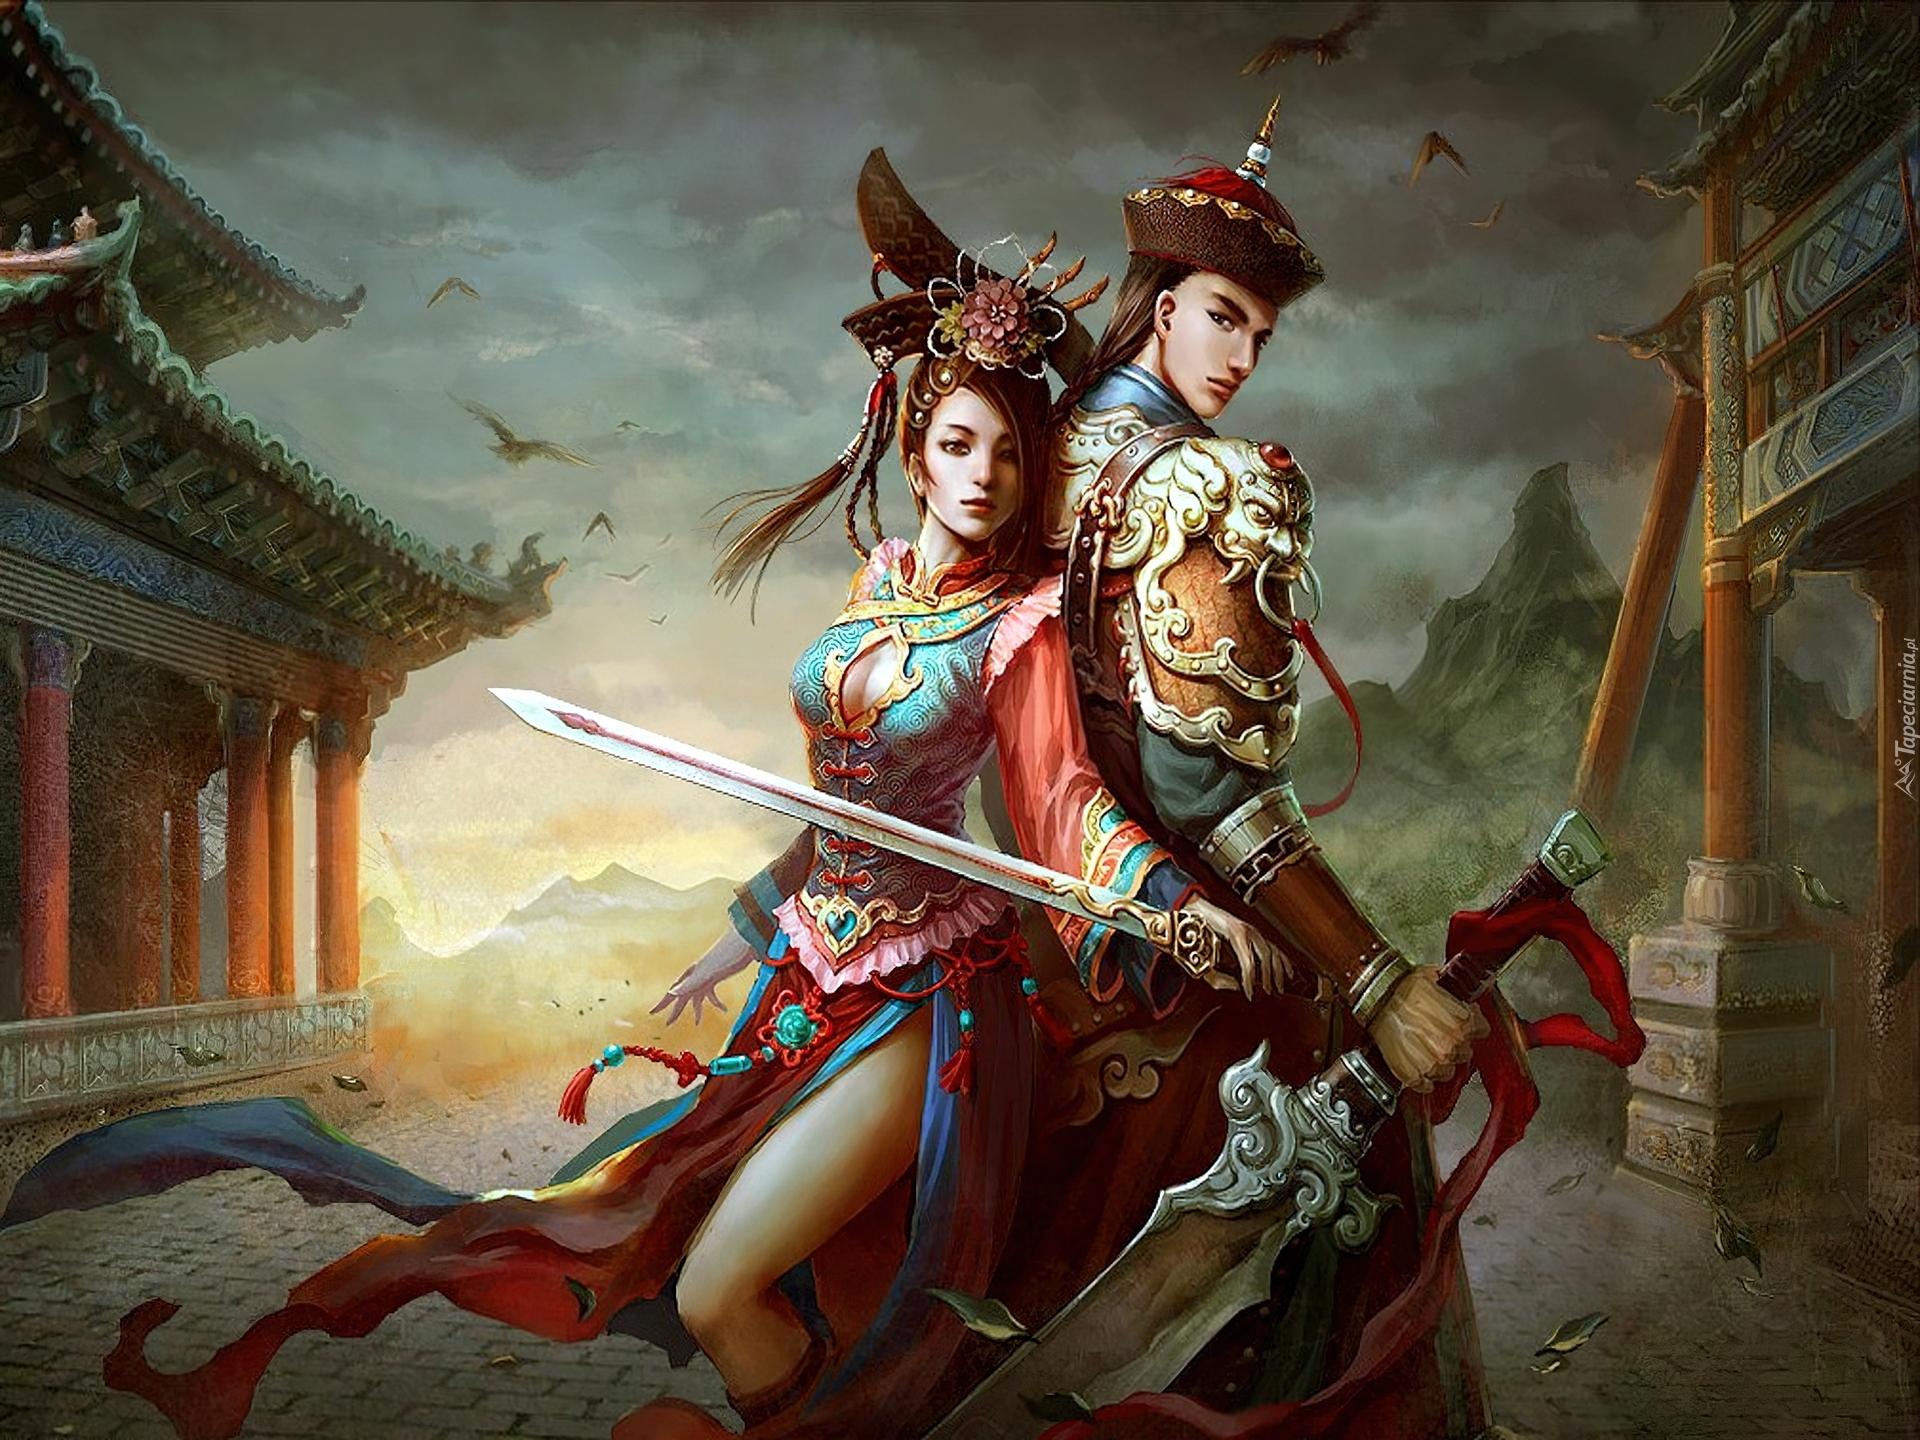 Beautiful Chinese Girl Paintings Widescreen Wallpaper Dziewczyna Chłopiec Stroje Ludowe